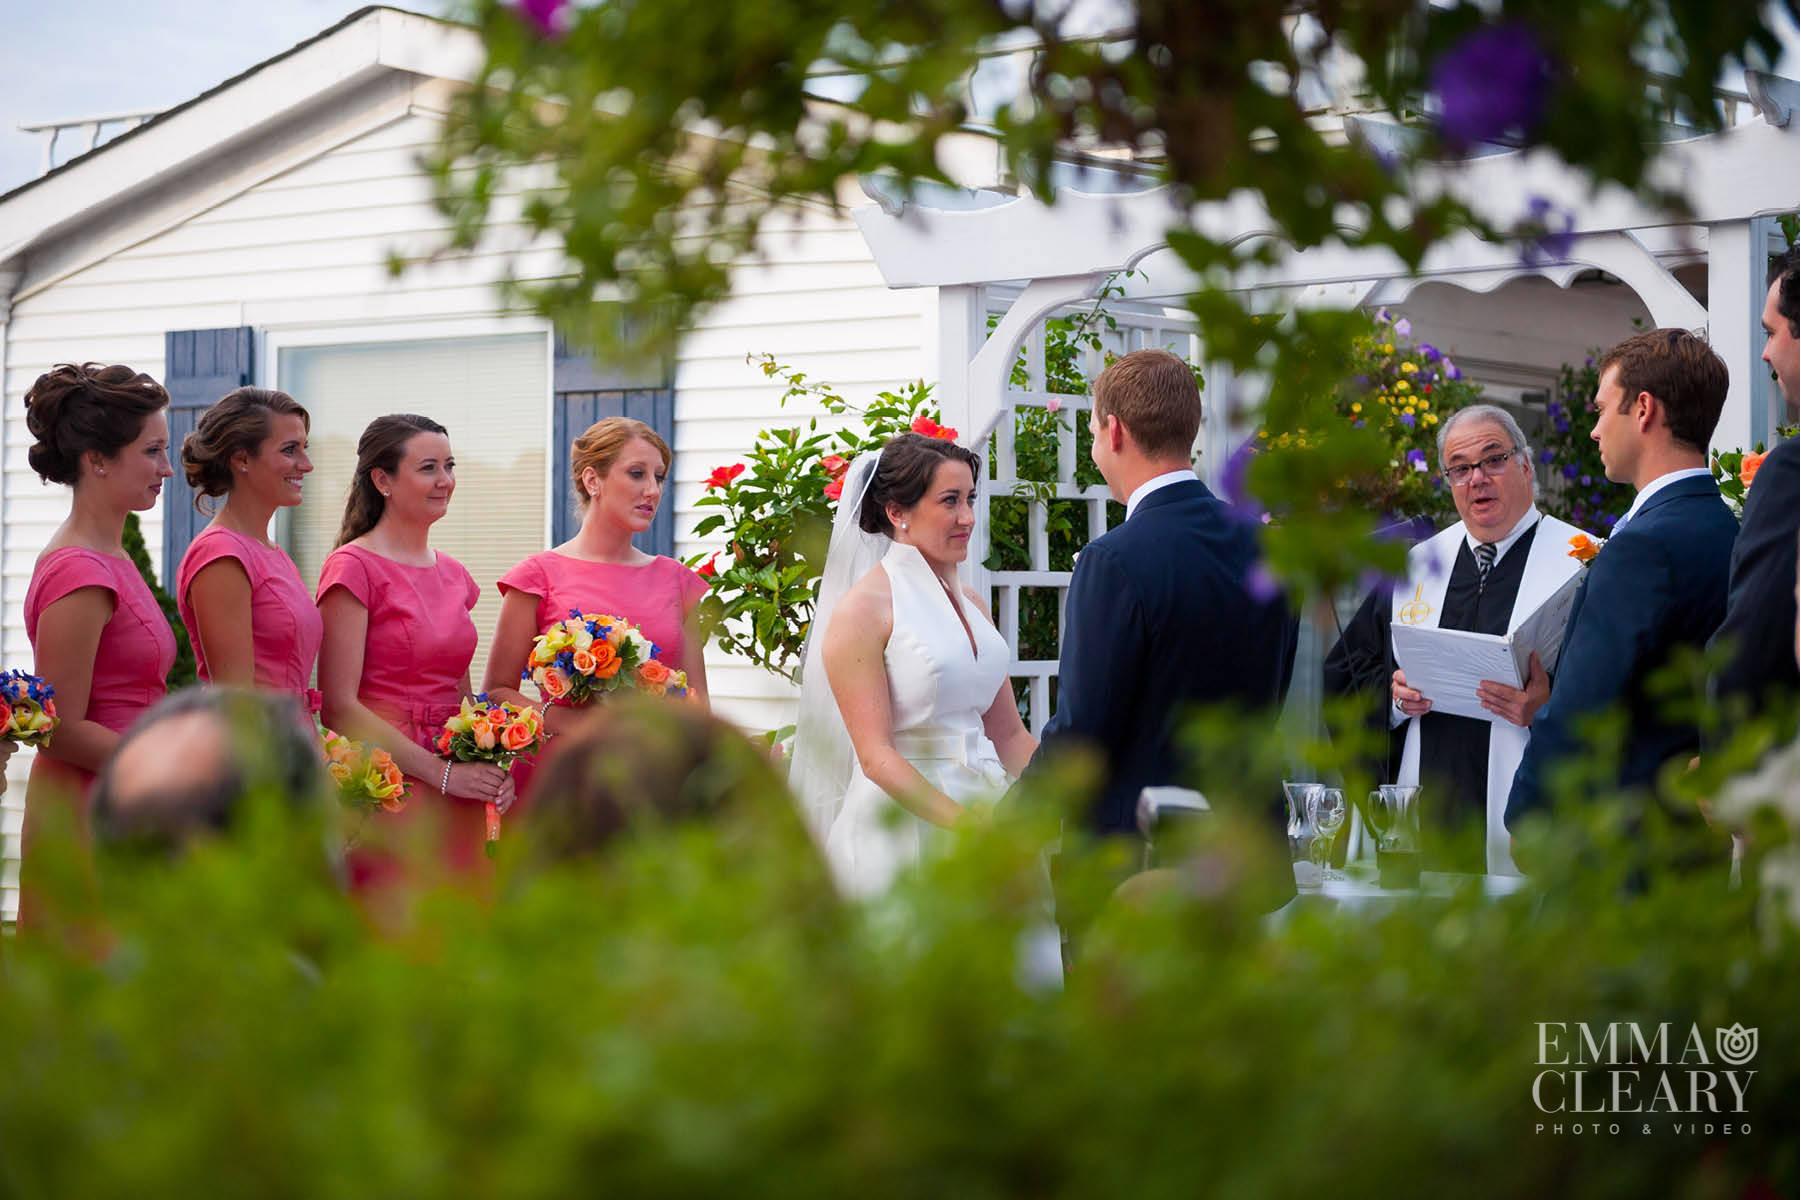 Emma Cleary Photography, Danfords Marina wedding19